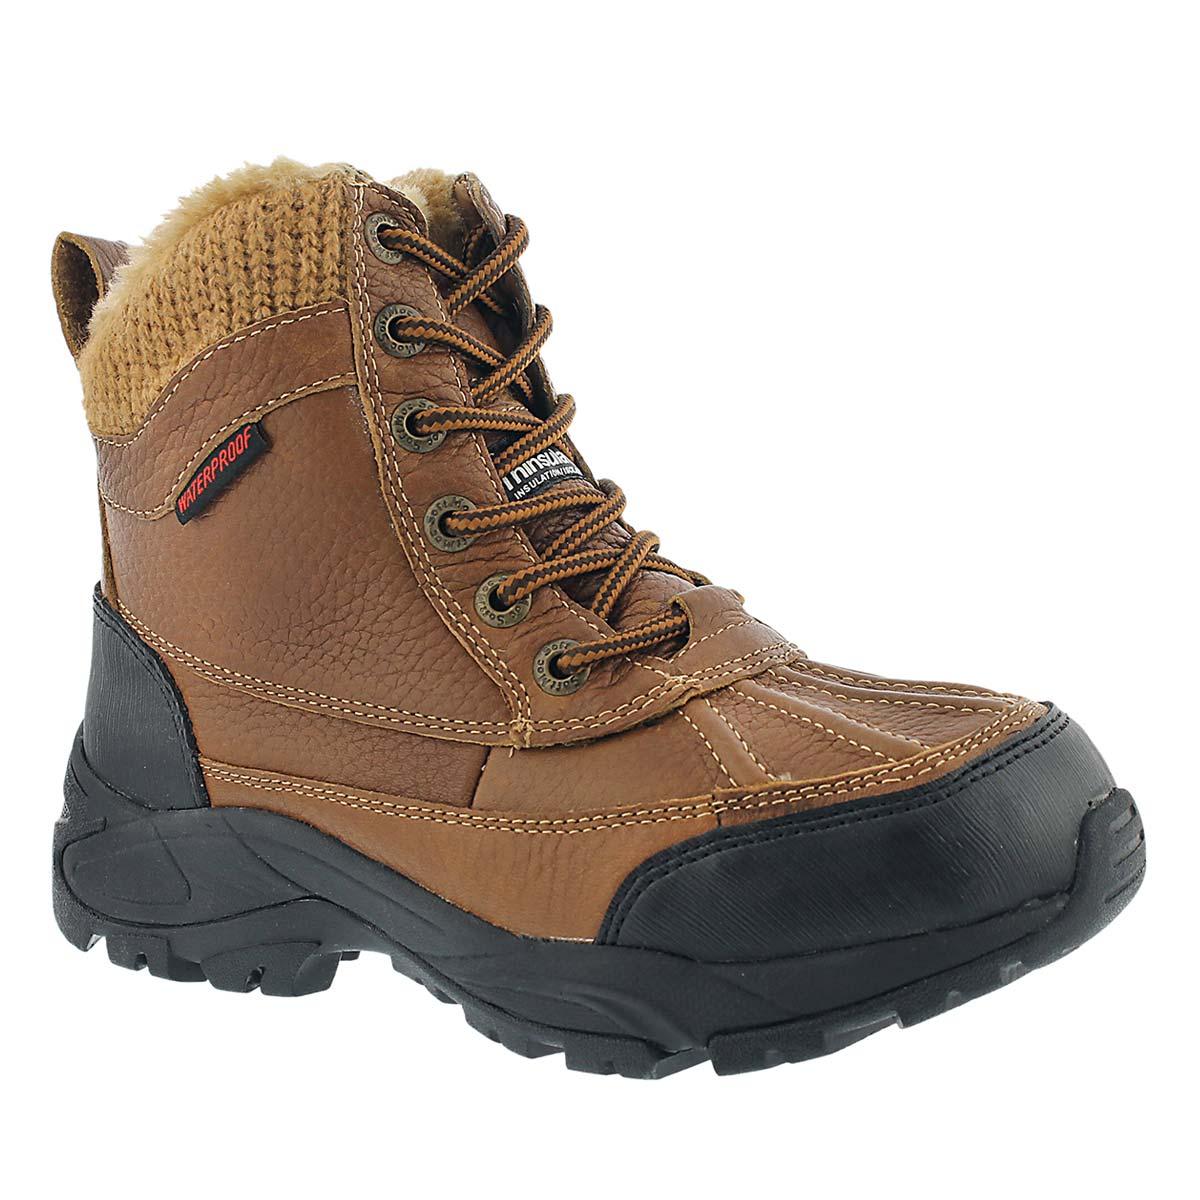 Lds Madelynn brown wtpf winter boot